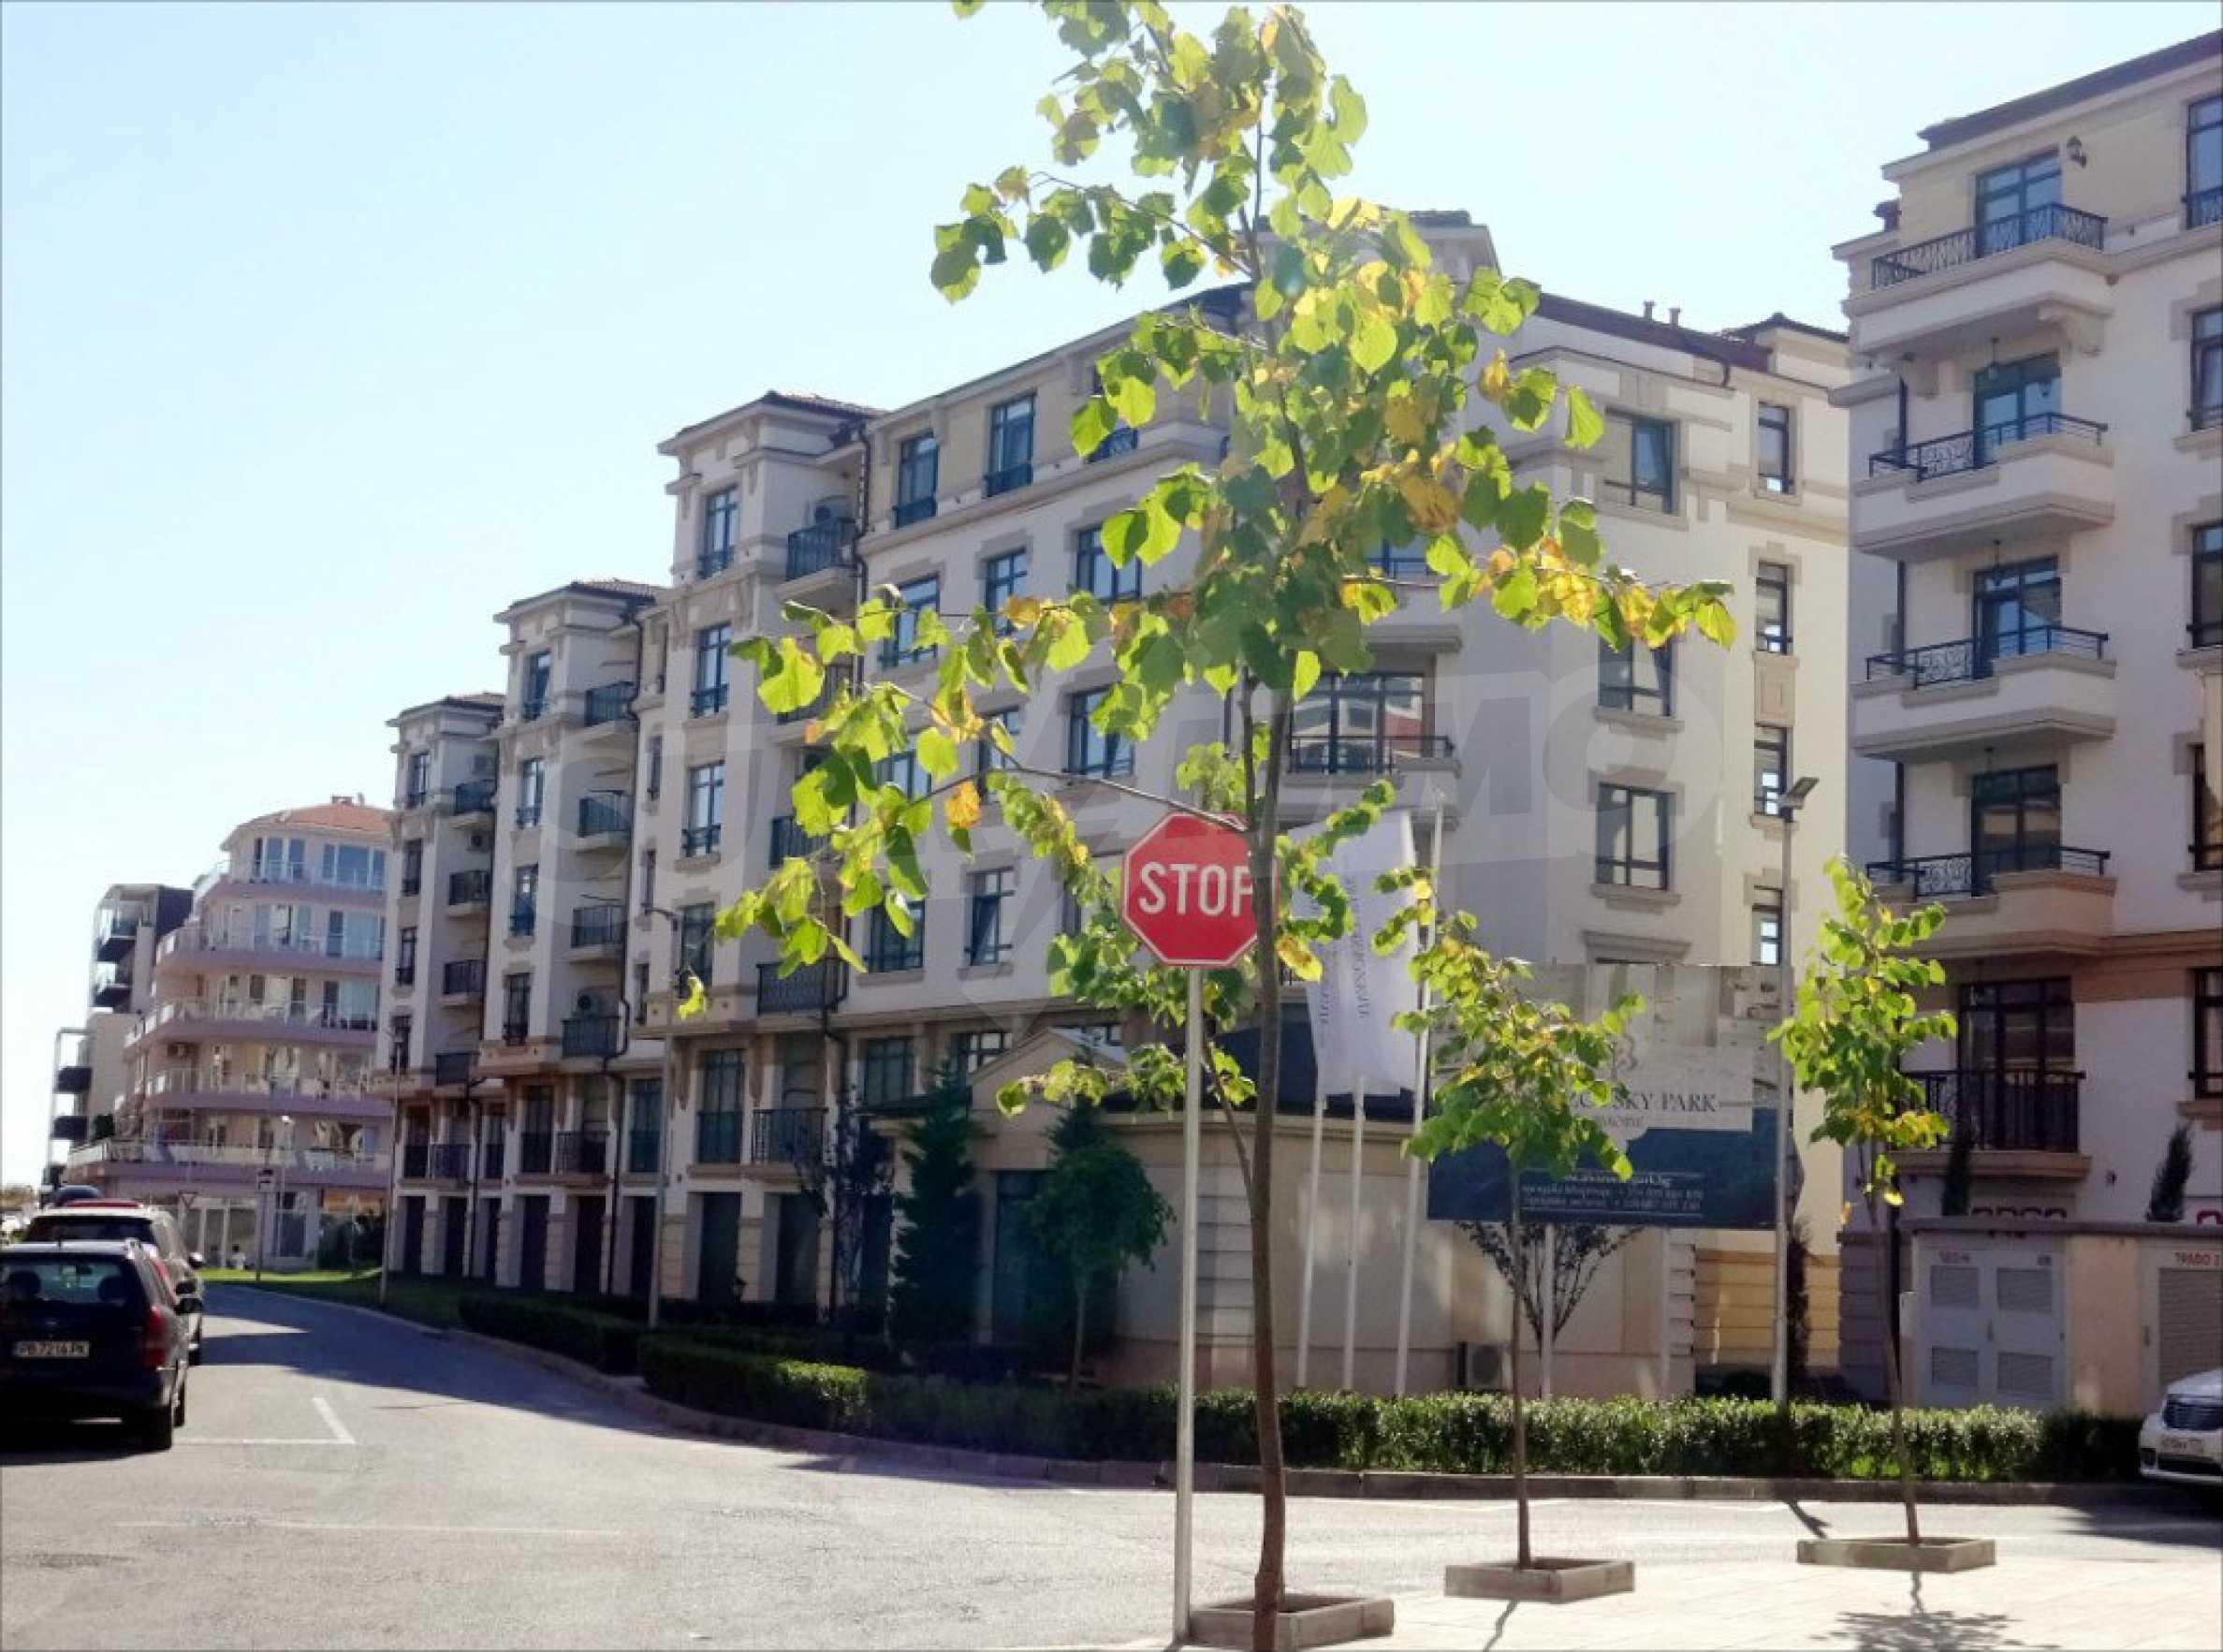 Aivazovsky Park 35